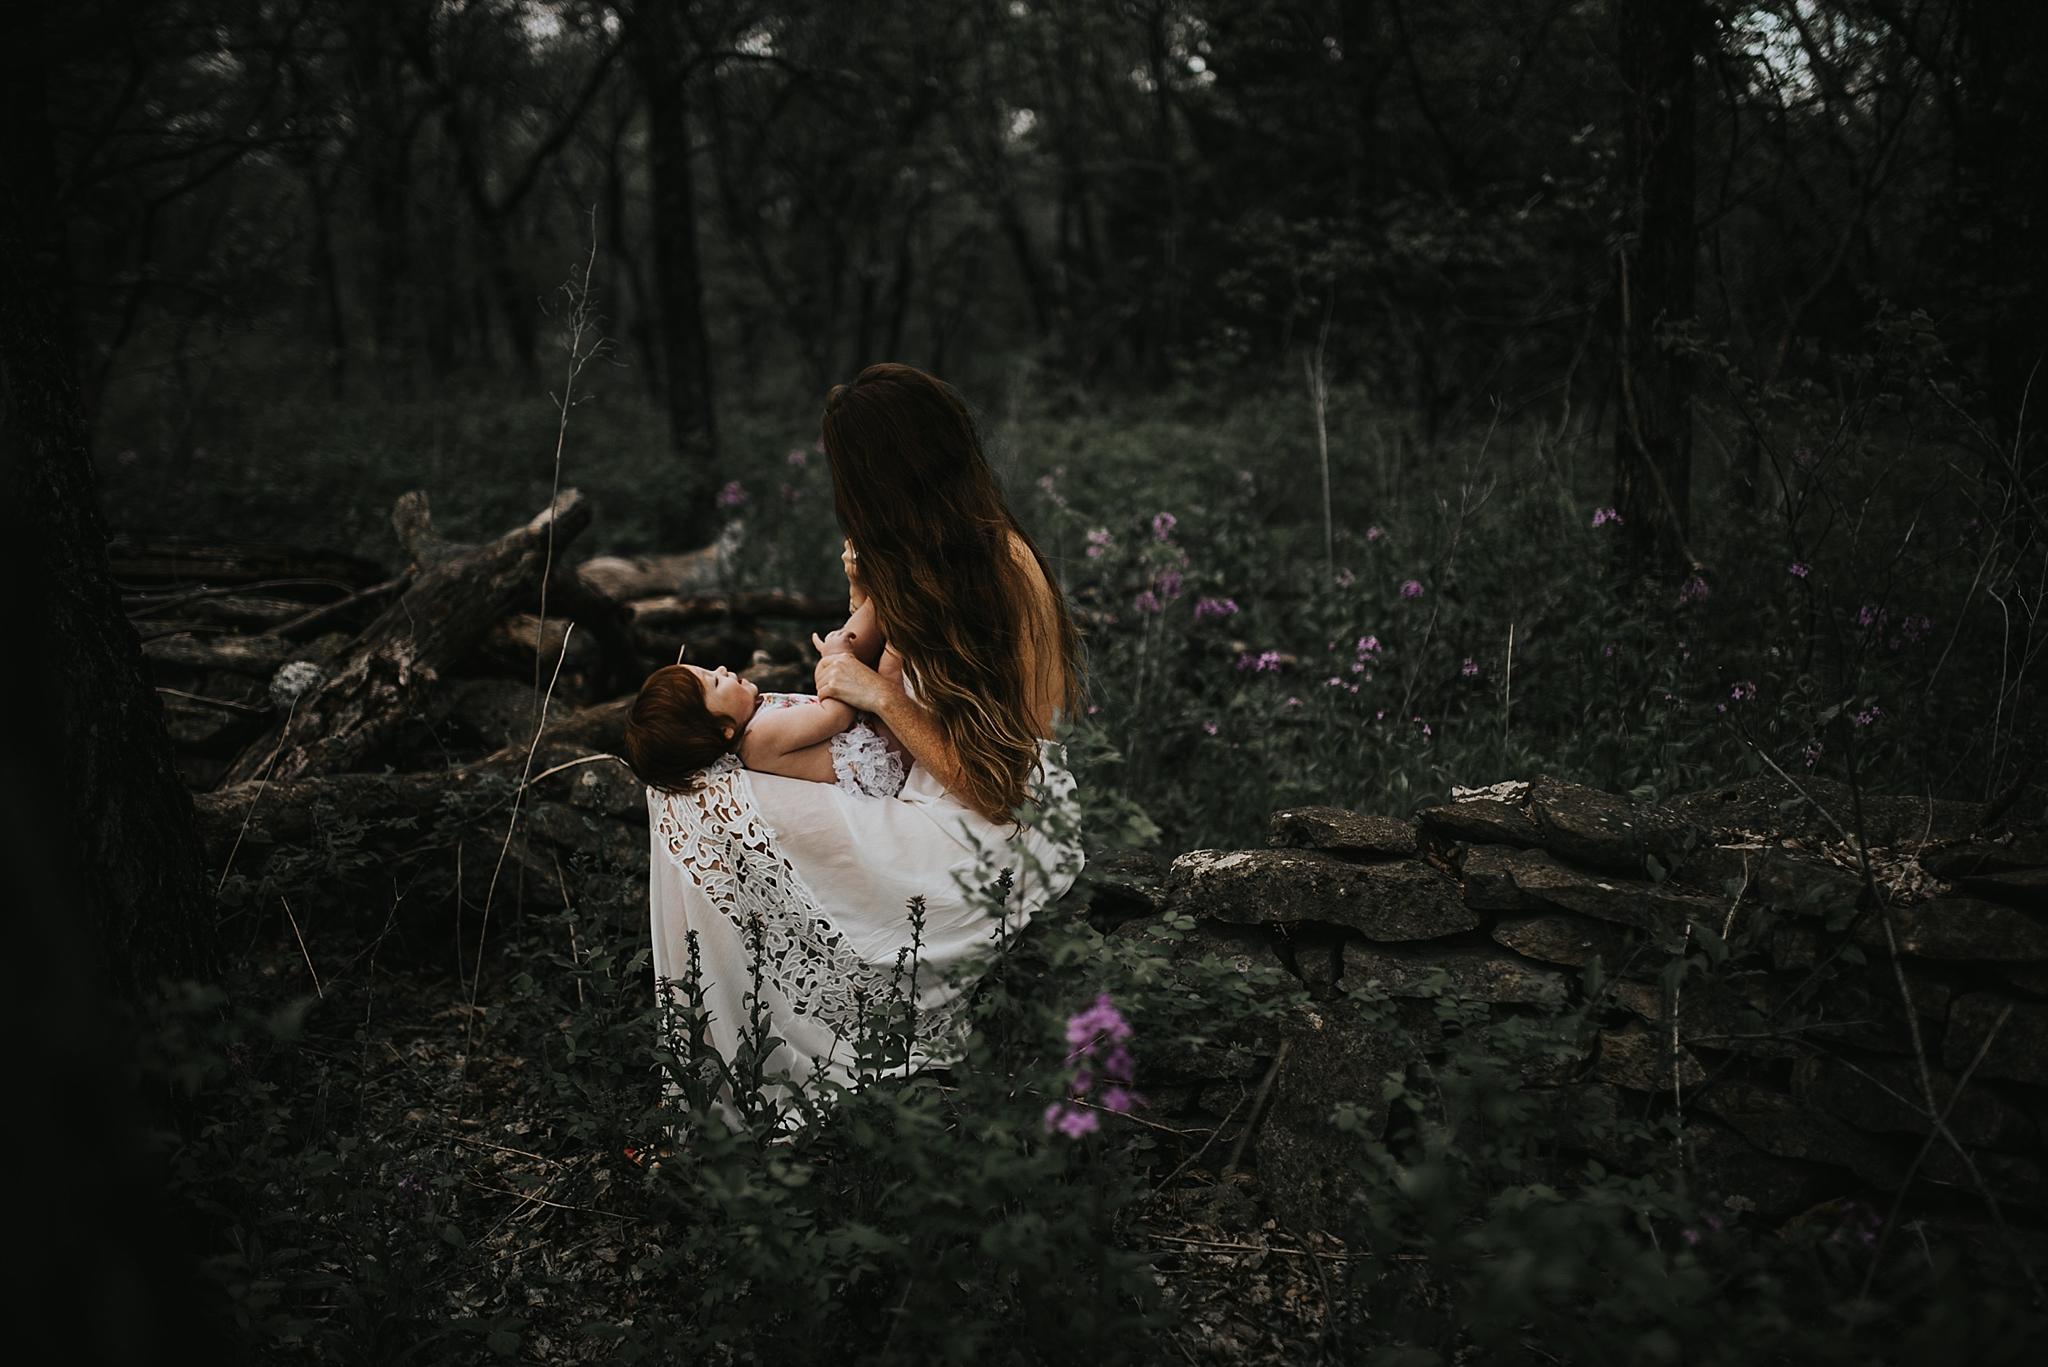 twyla jones photography - mother daughter - field and forest-4708_treasure coast florida.jpg